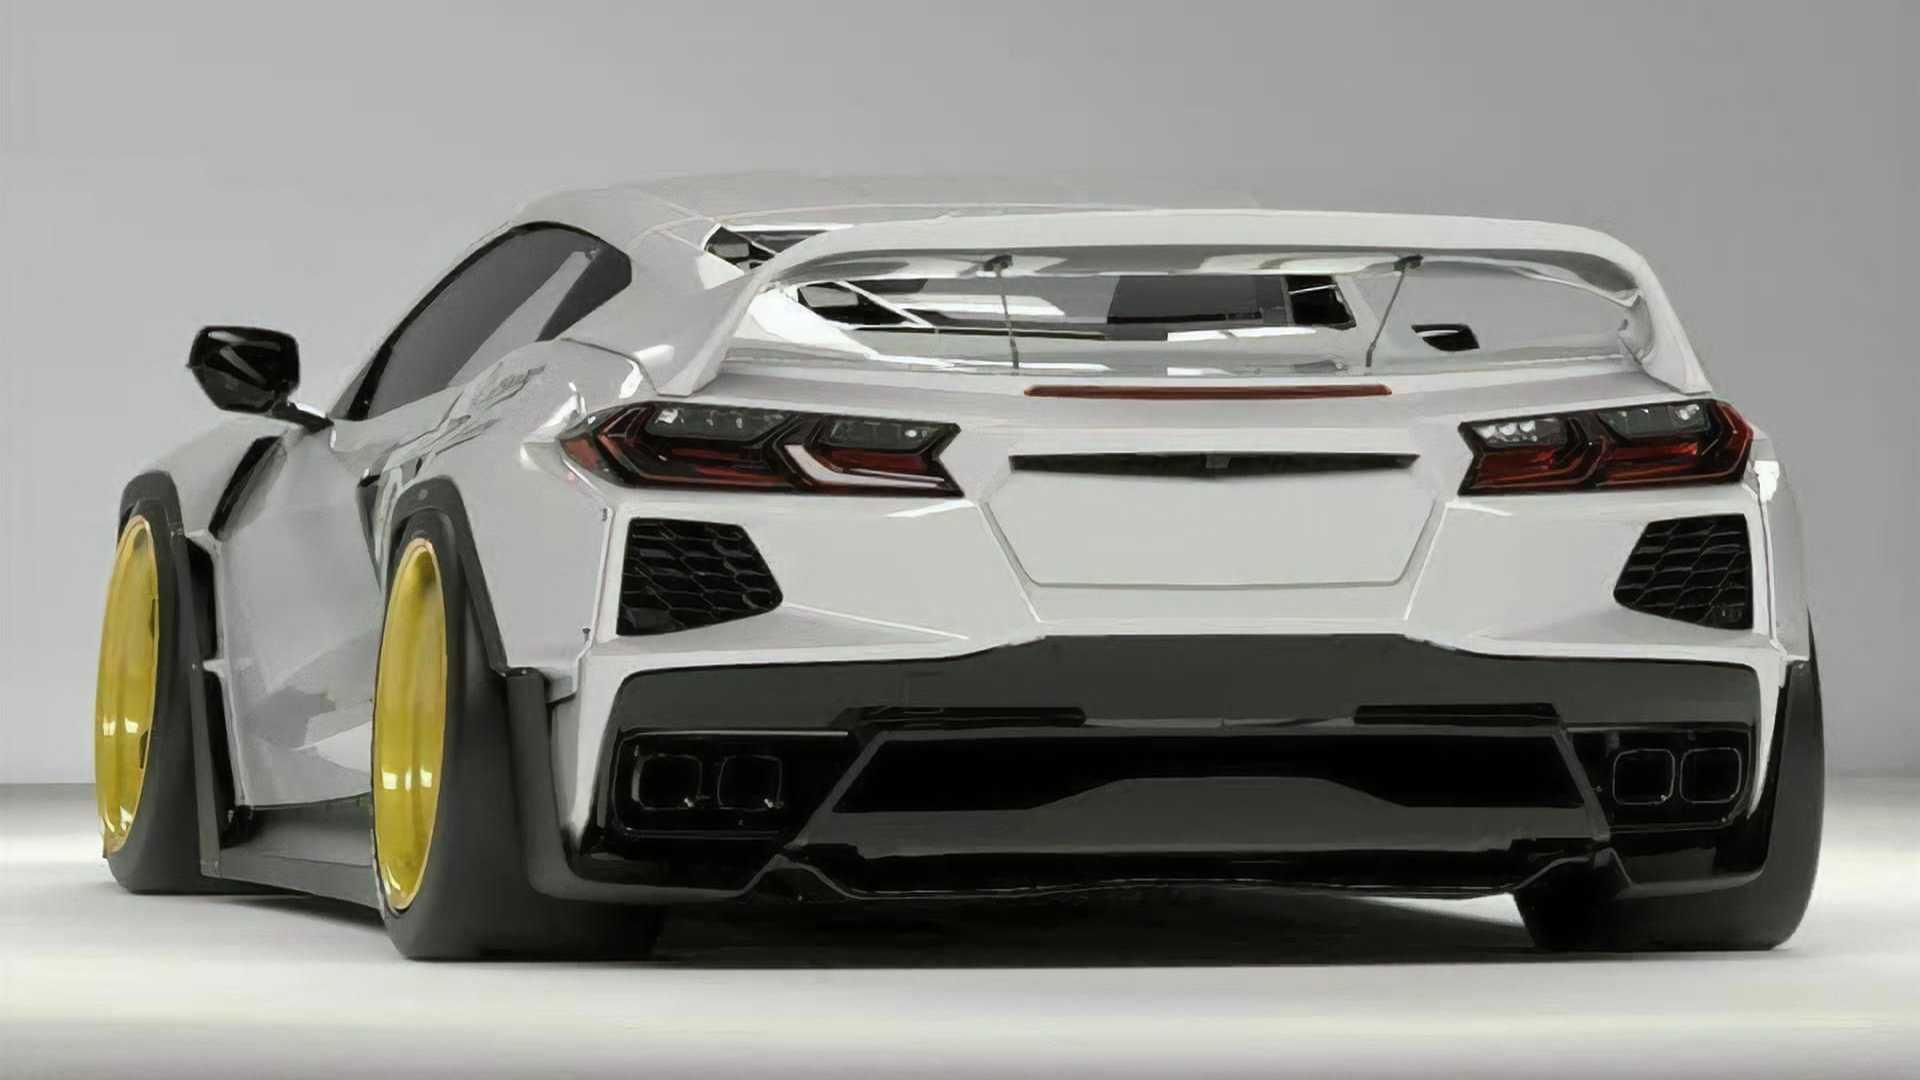 Chevrolet-Corvette-C8-with-Pandem-Rocket-Bunny-bodykit-5